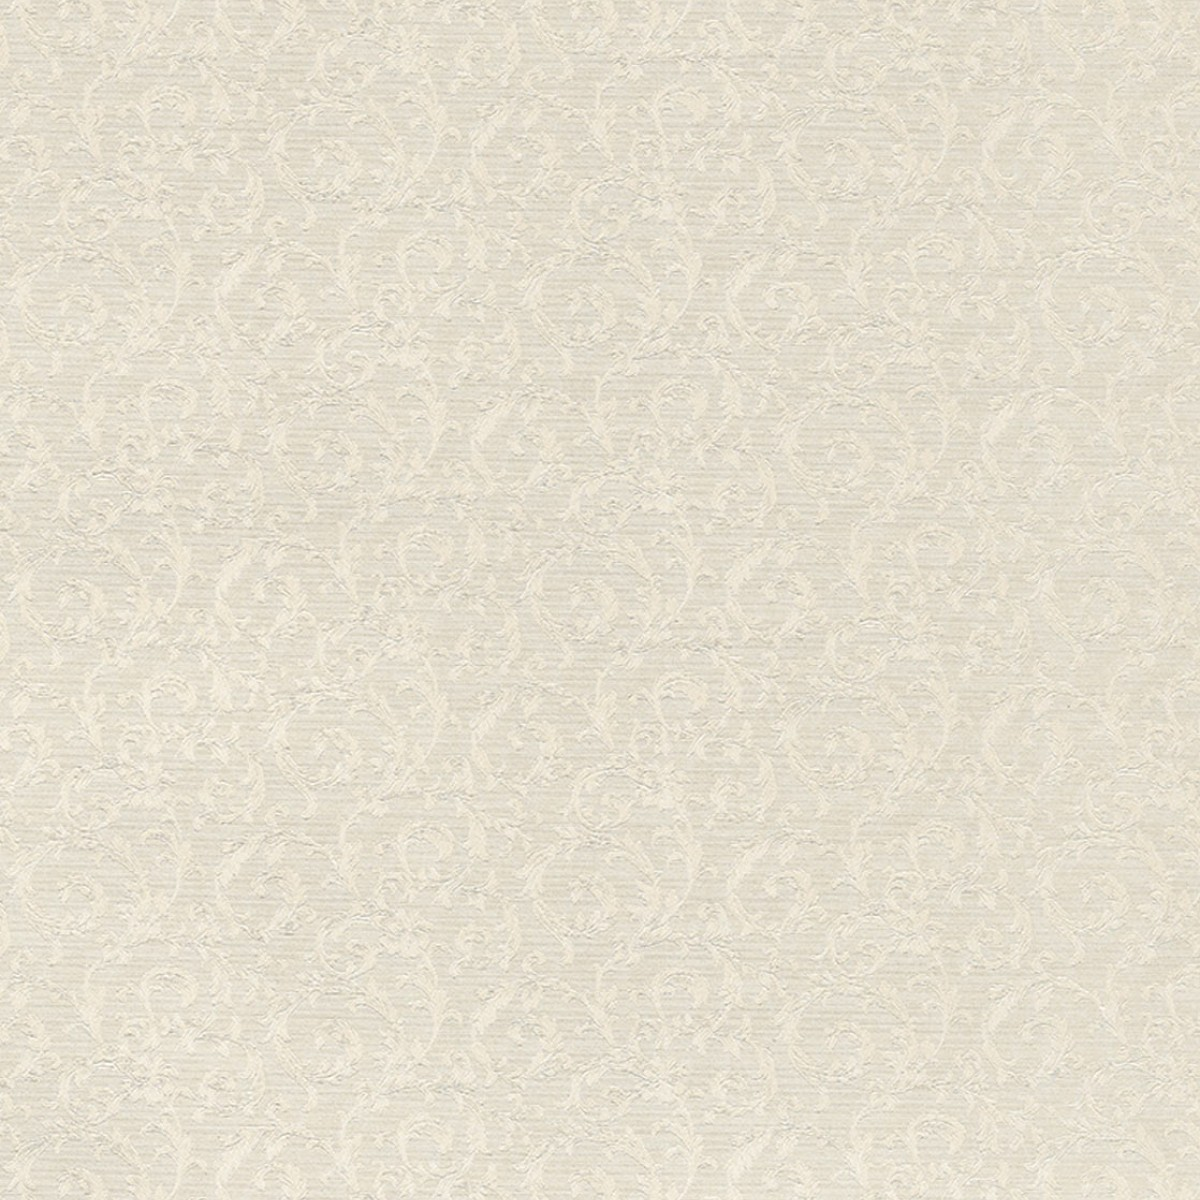 Tapet lavabil Chambord 36104, 5.2mp / rolă, Eijffinger